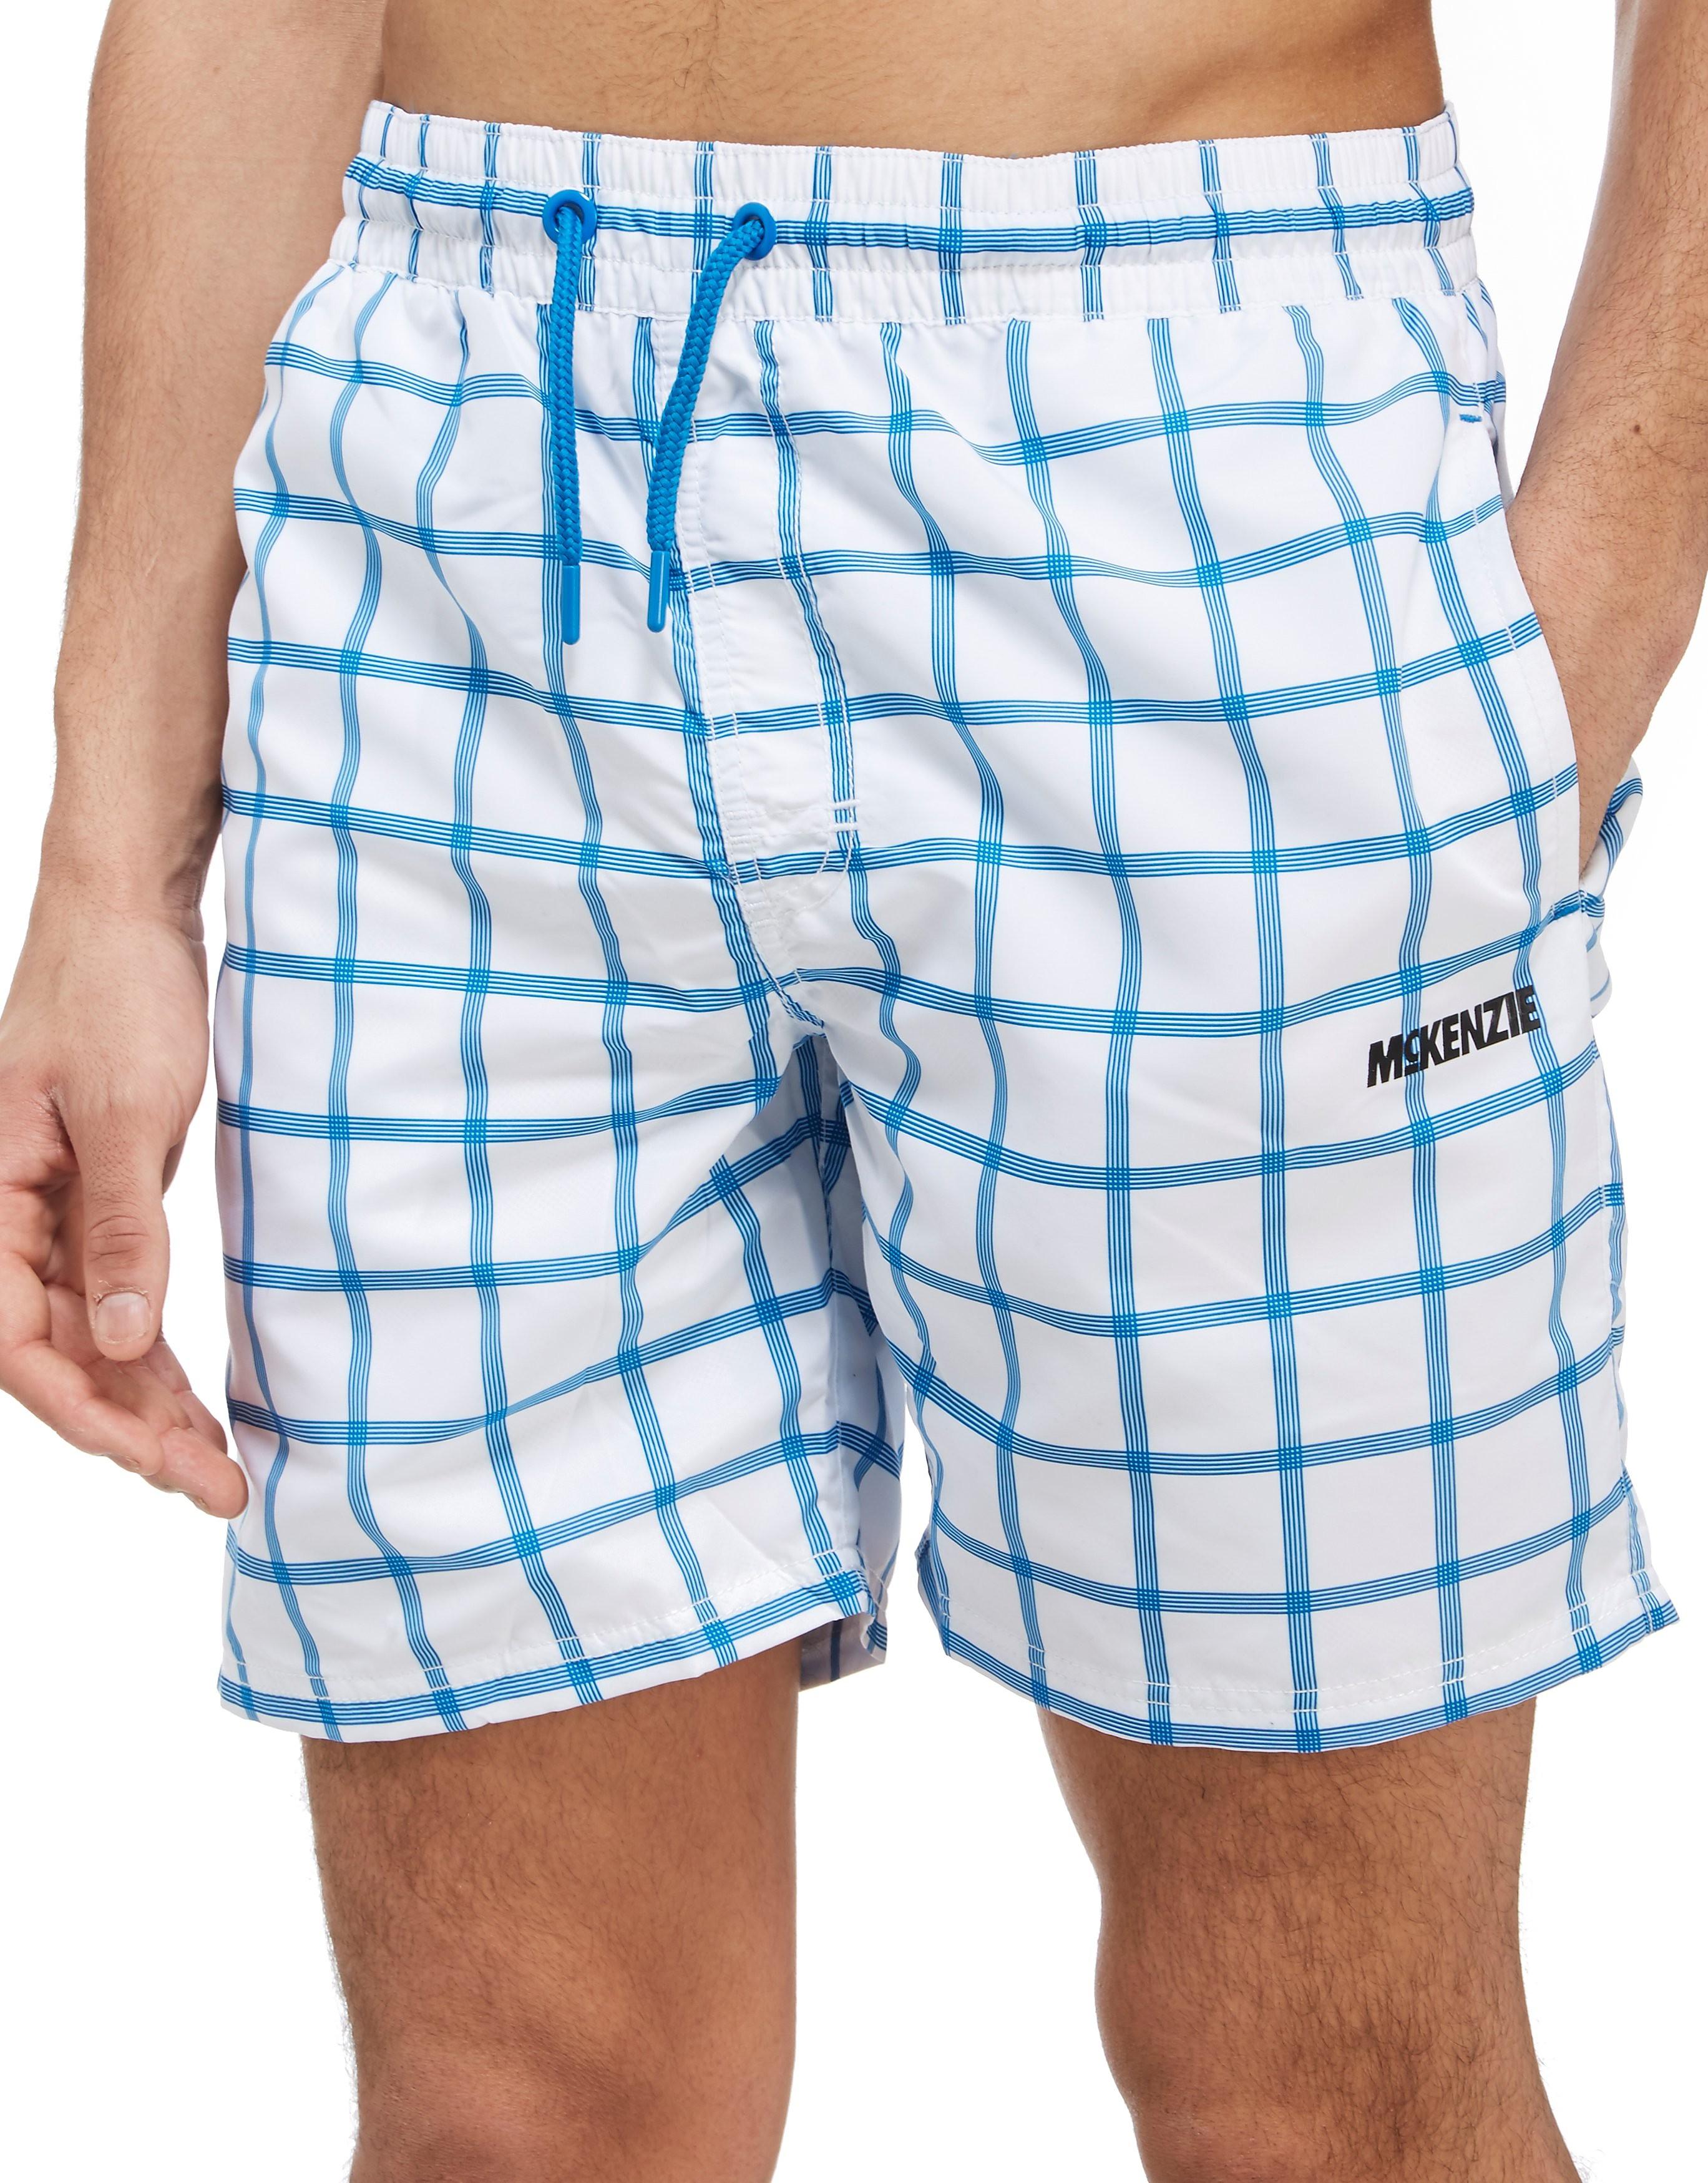 McKenzie Birch Swim Shorts